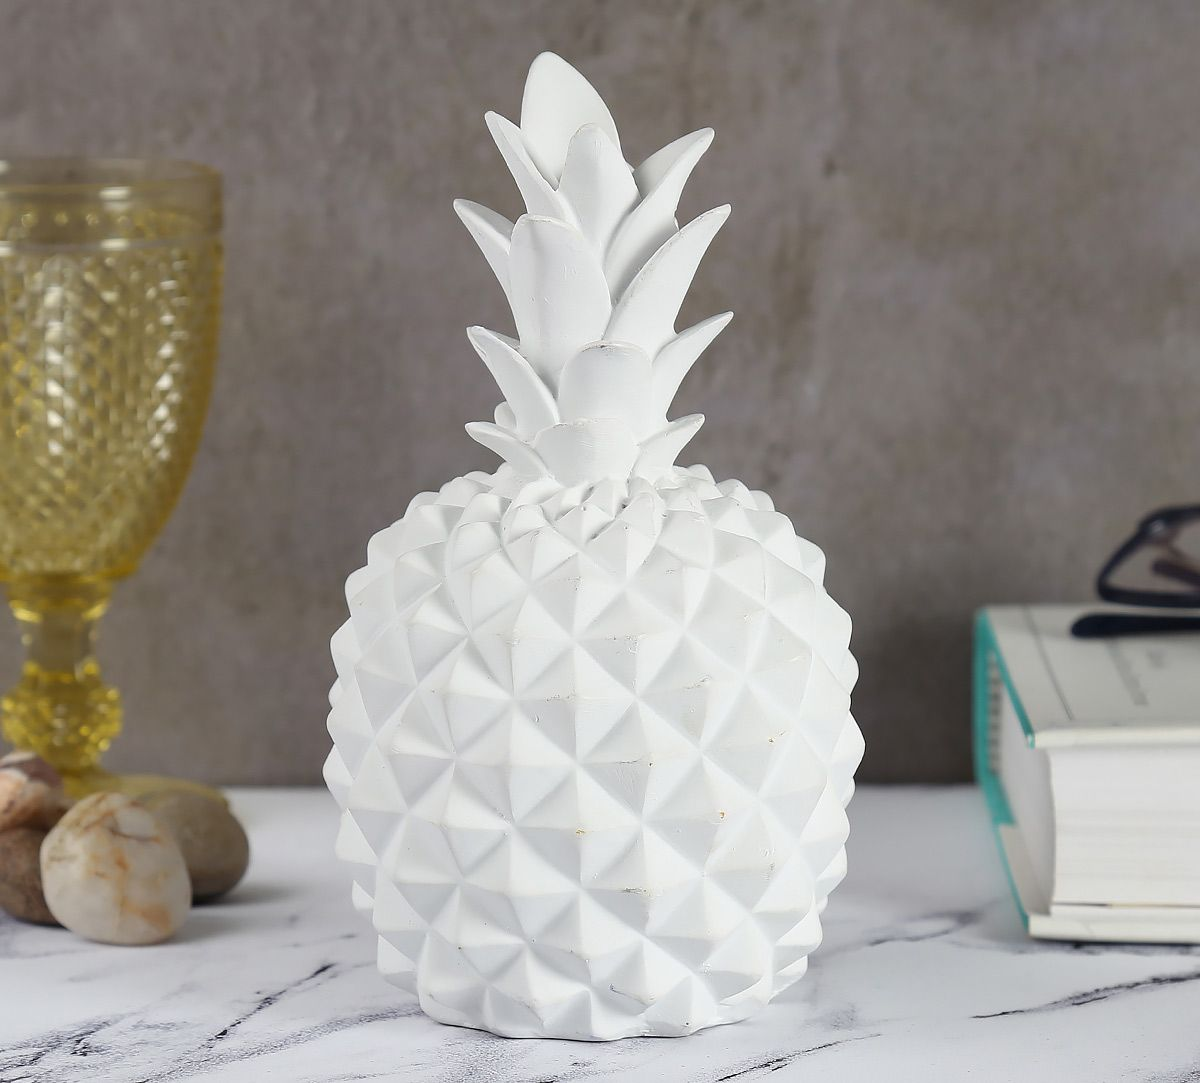 White Pineapple Decor Accent